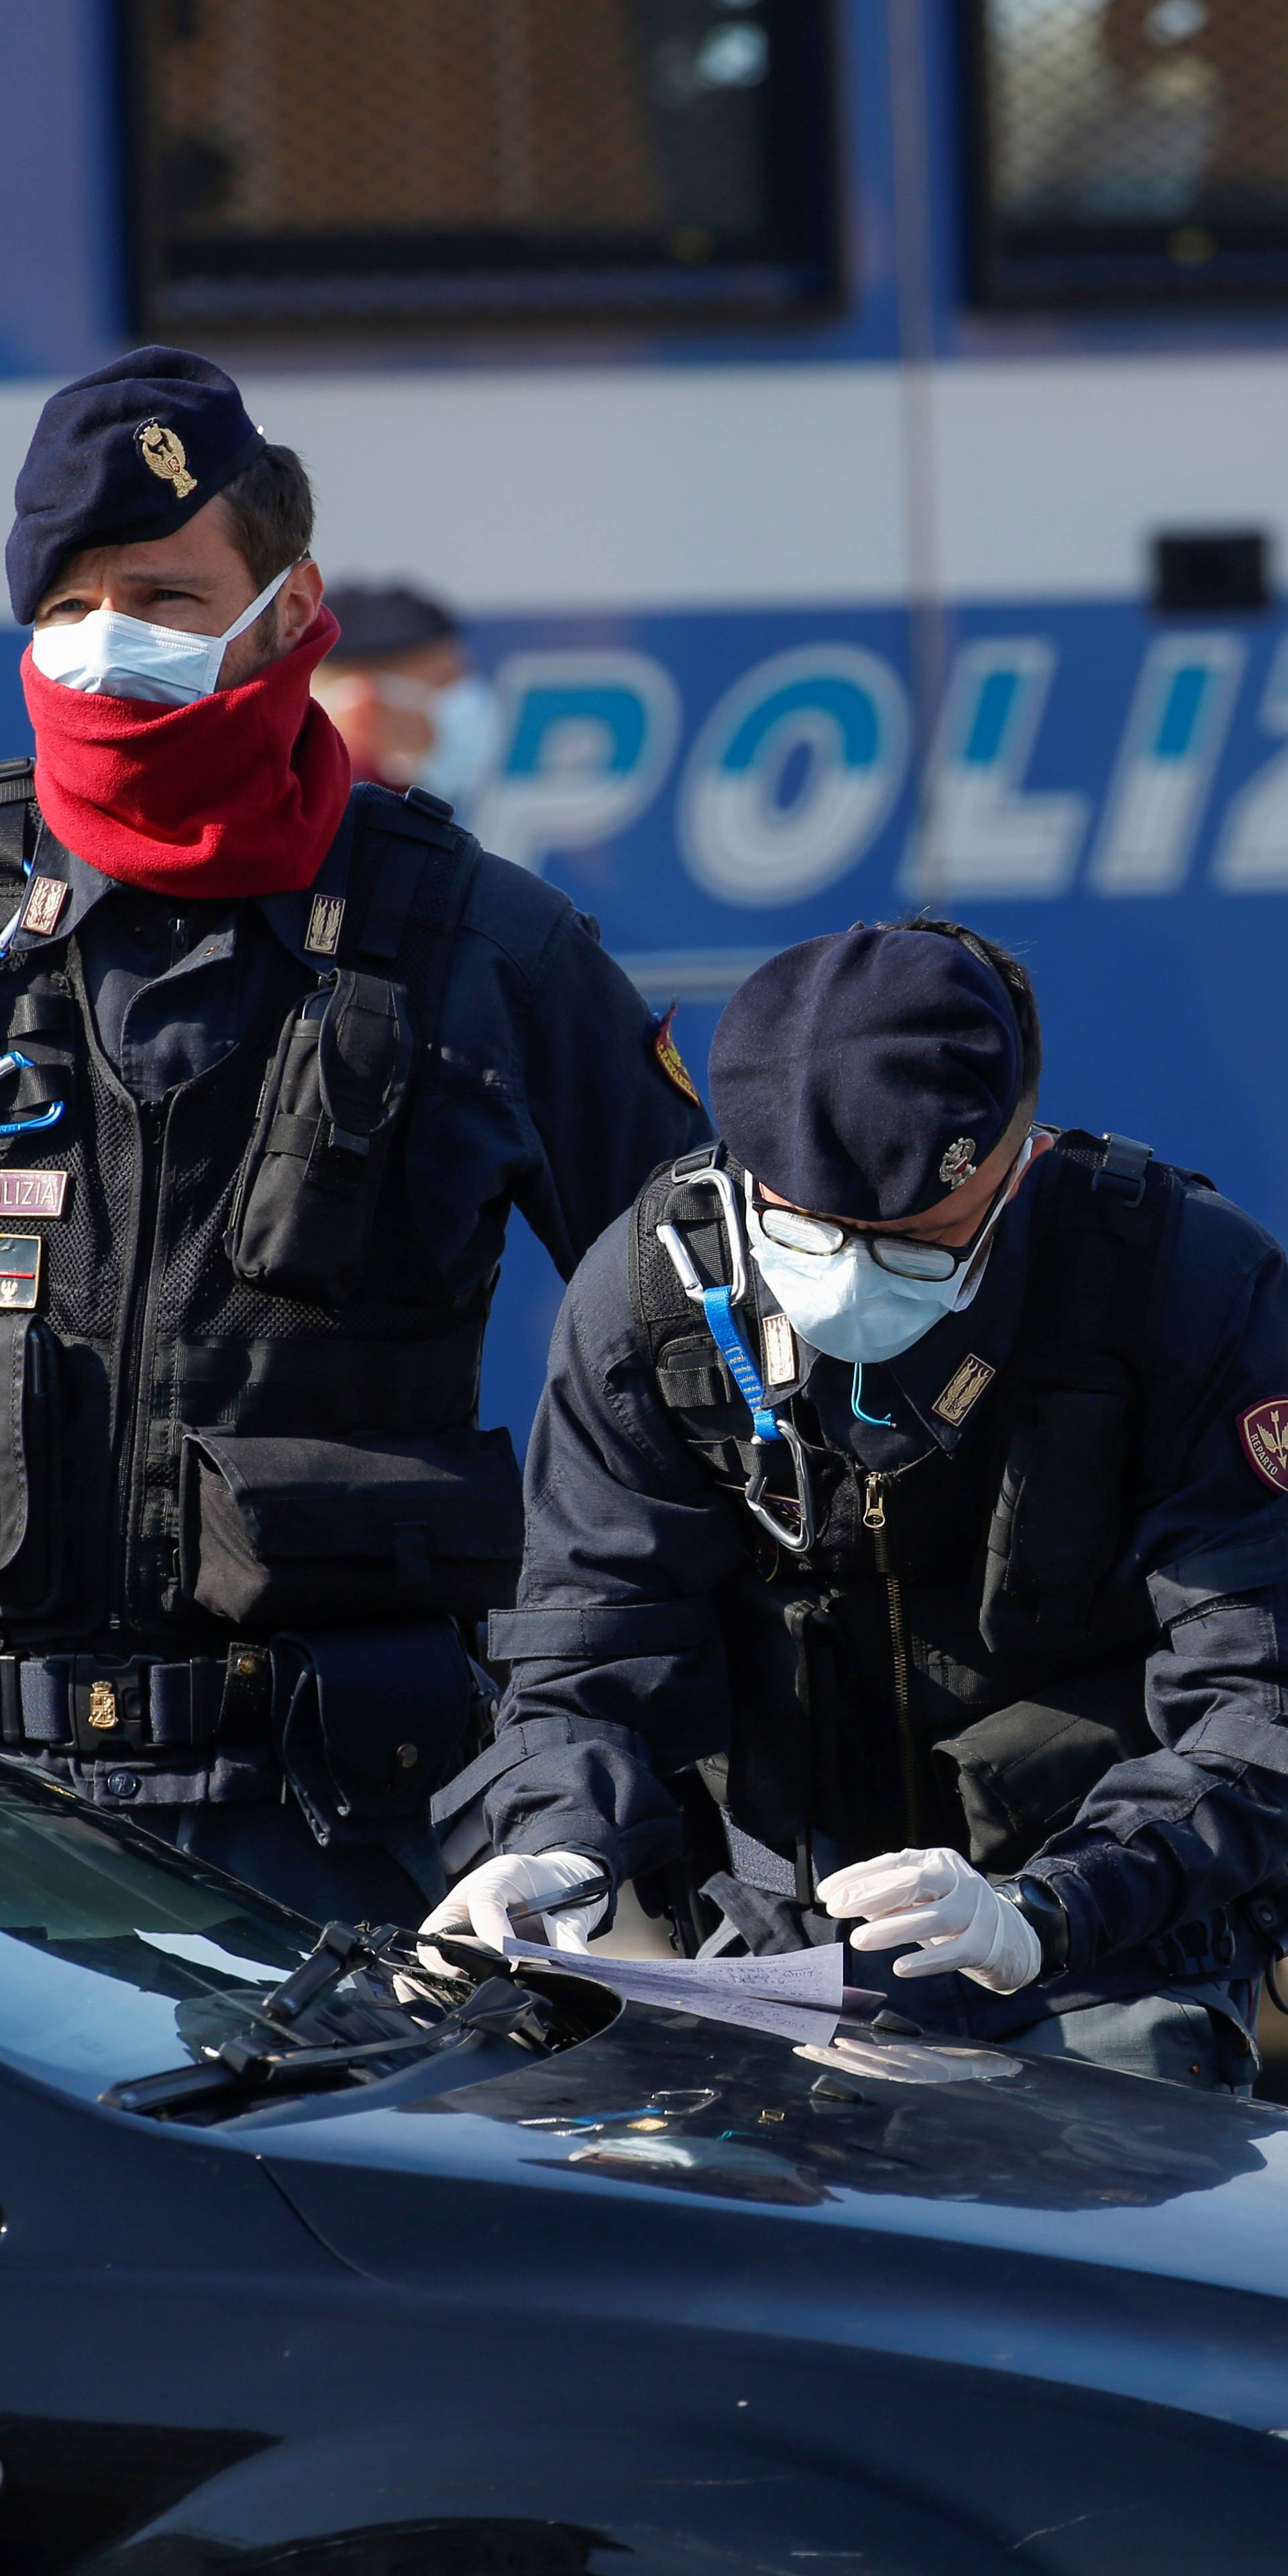 Rim: Bivšeg šefa kriminalnog podzemlja pustili iz pritvora